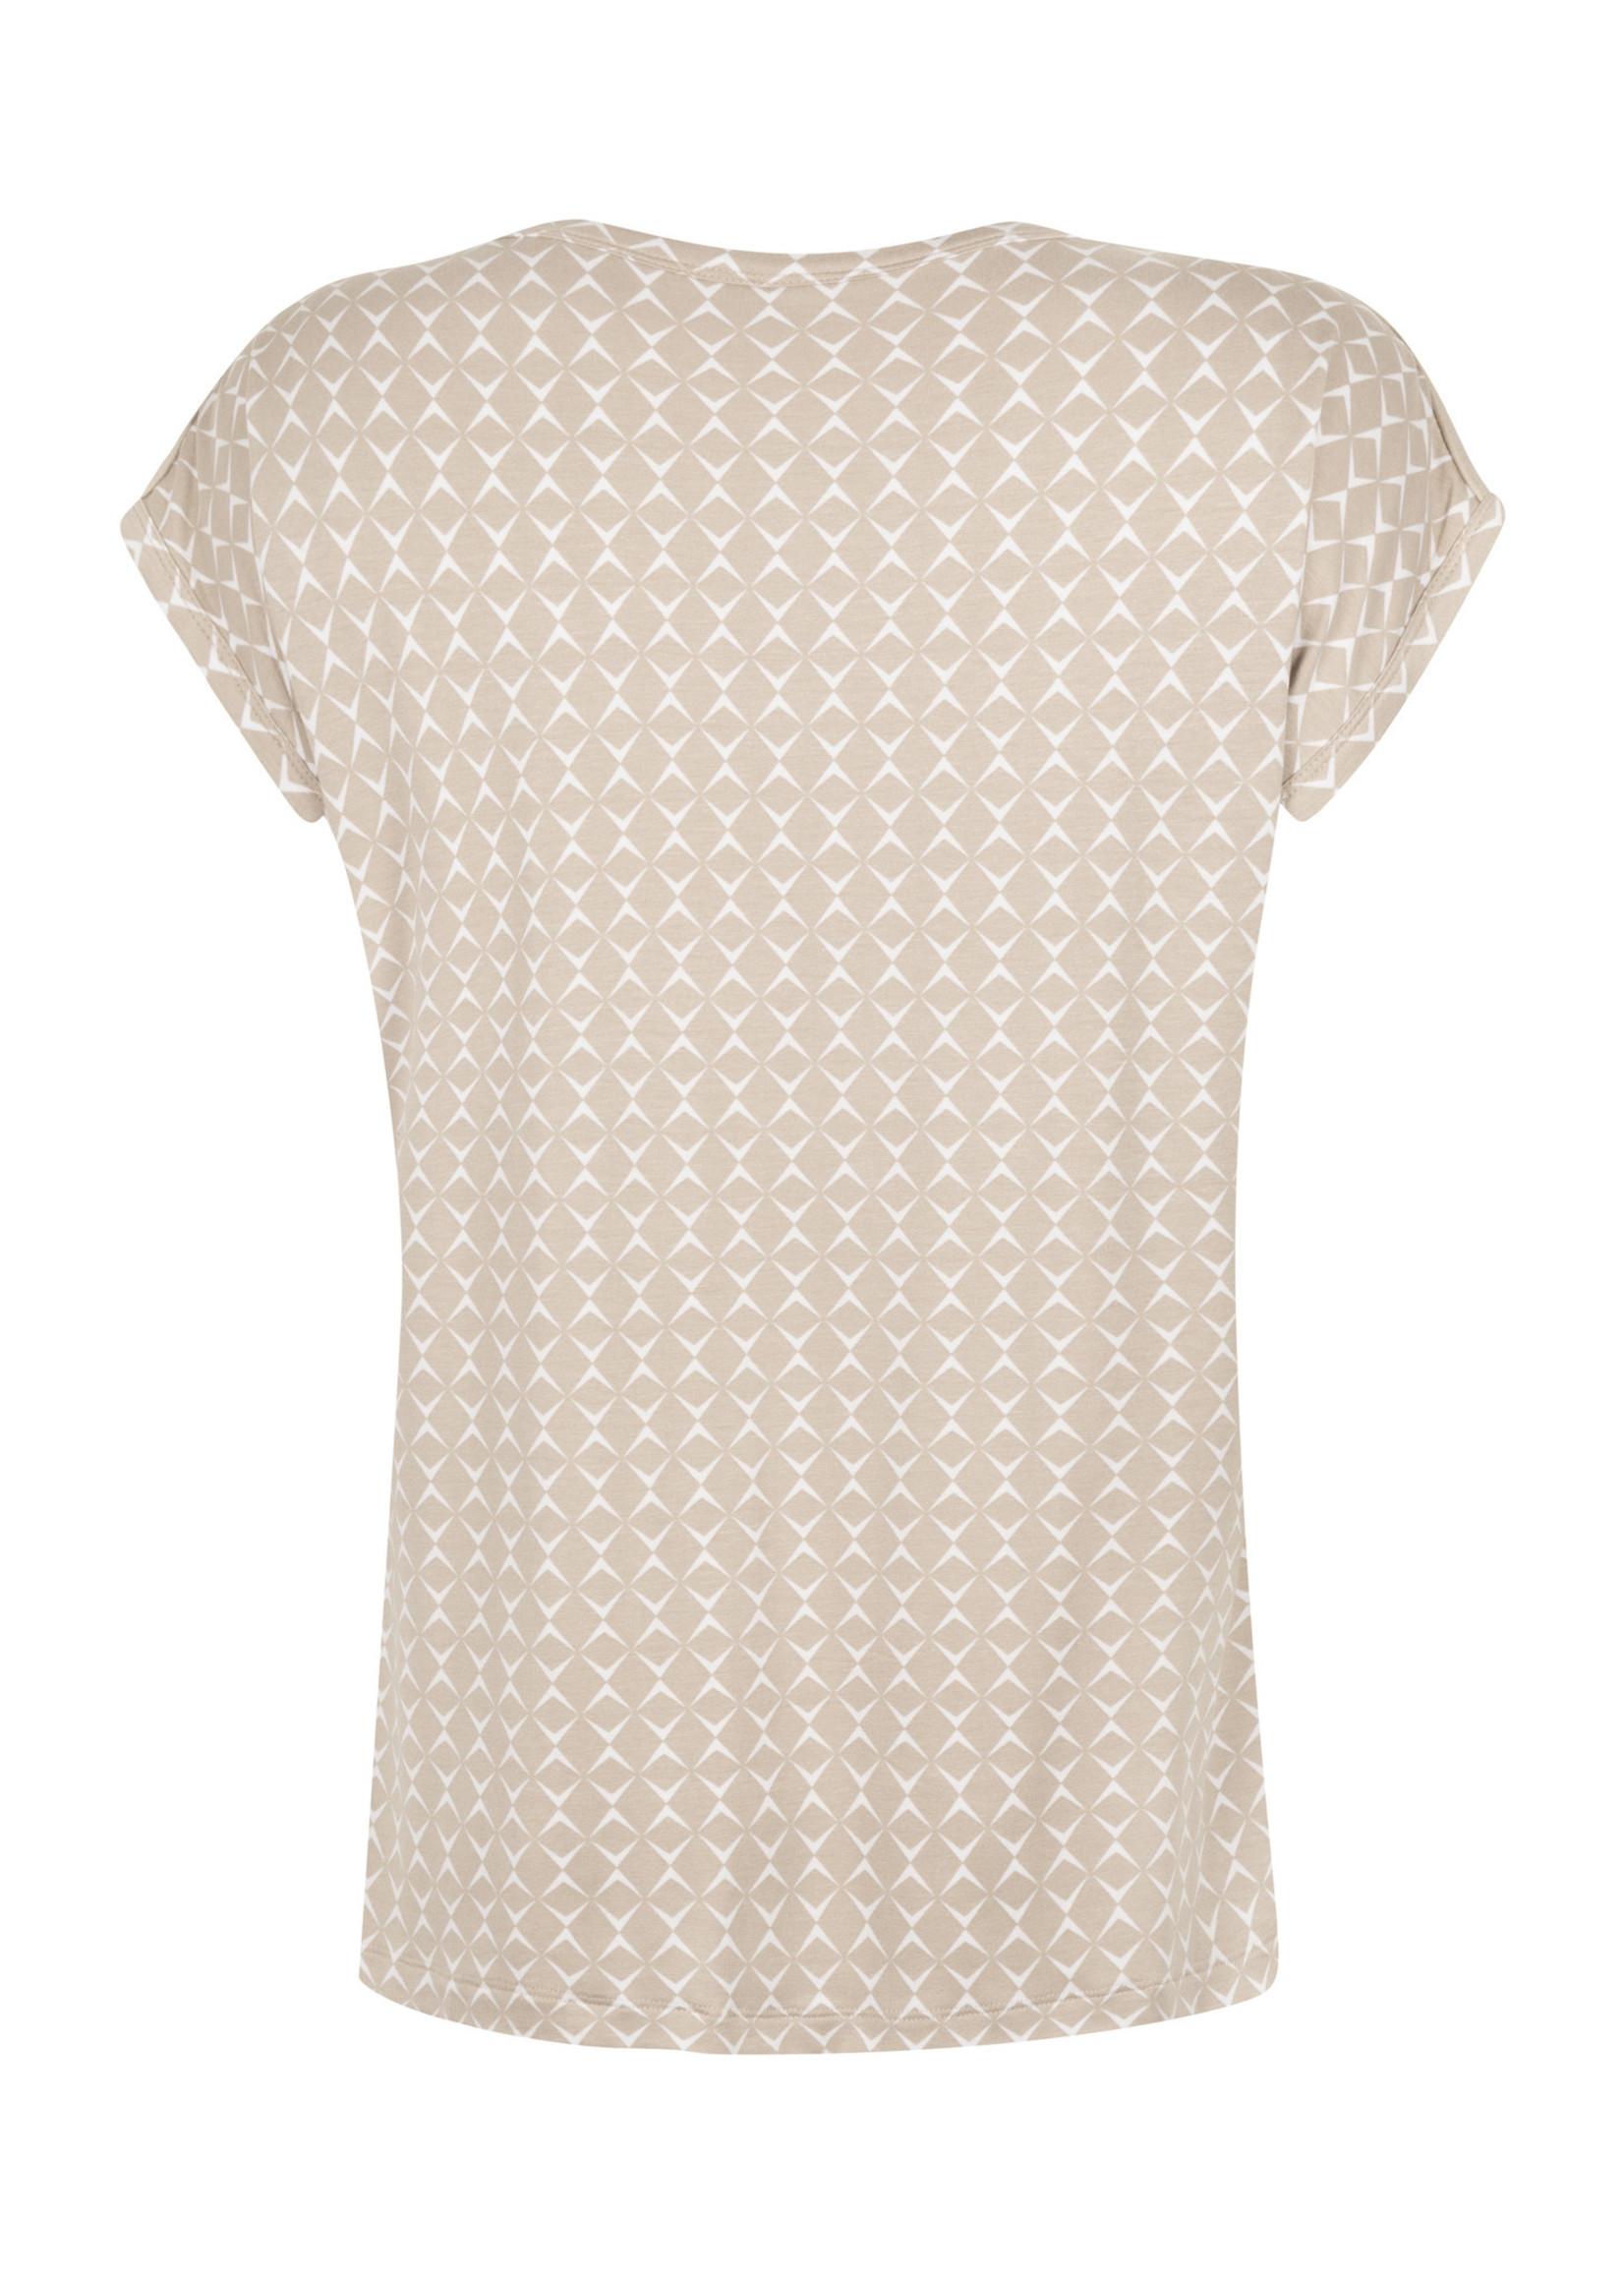 Zoso Claire Allover print shirt